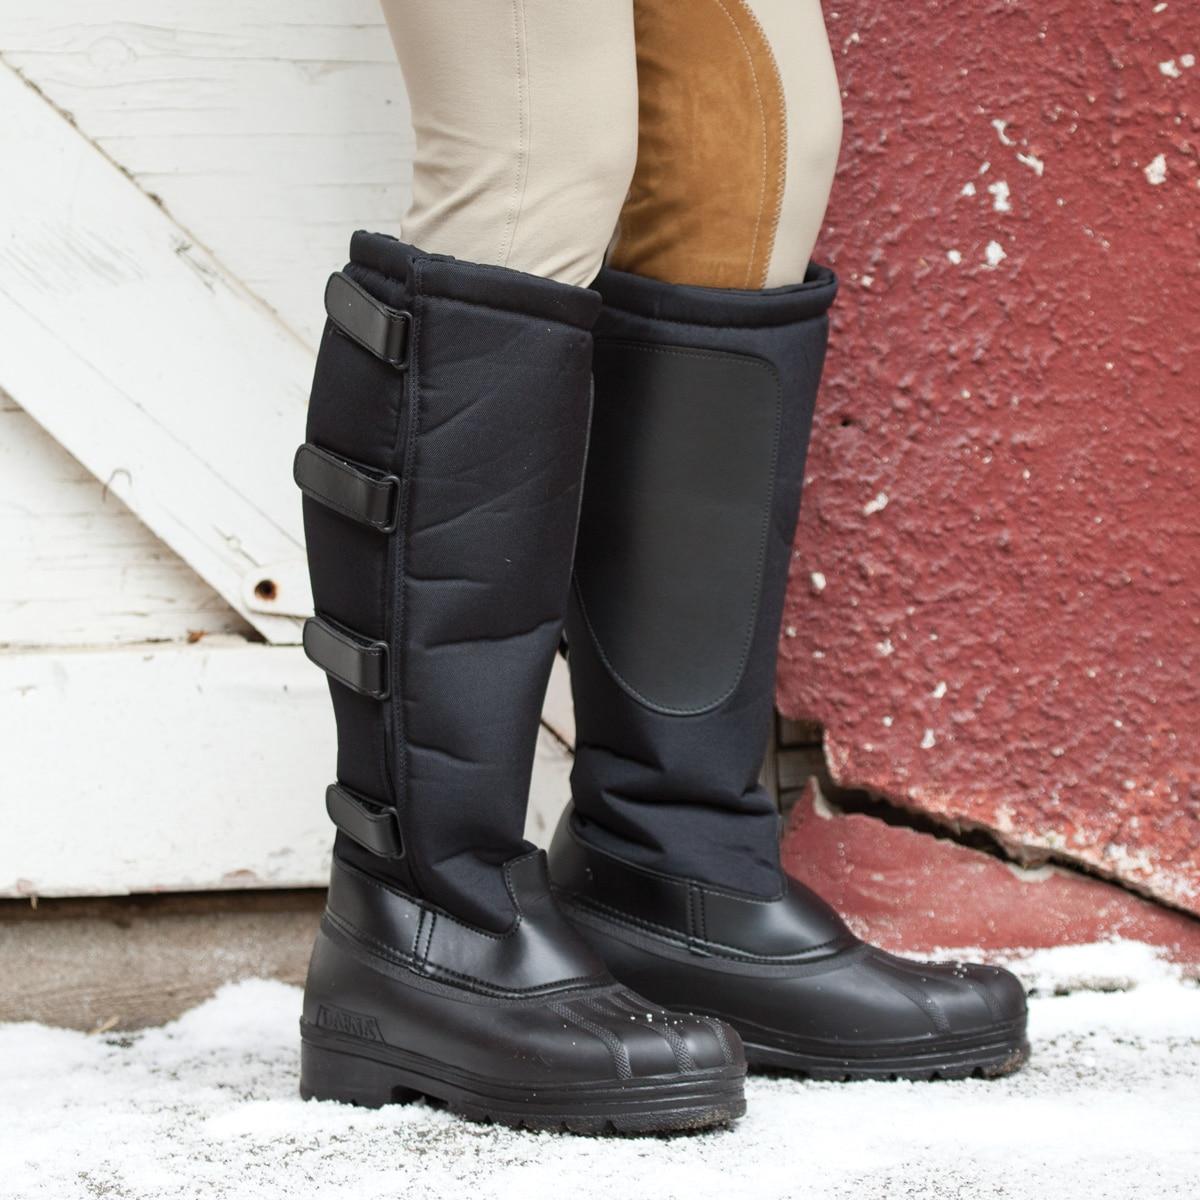 Ovation Blizzard Winter Boots